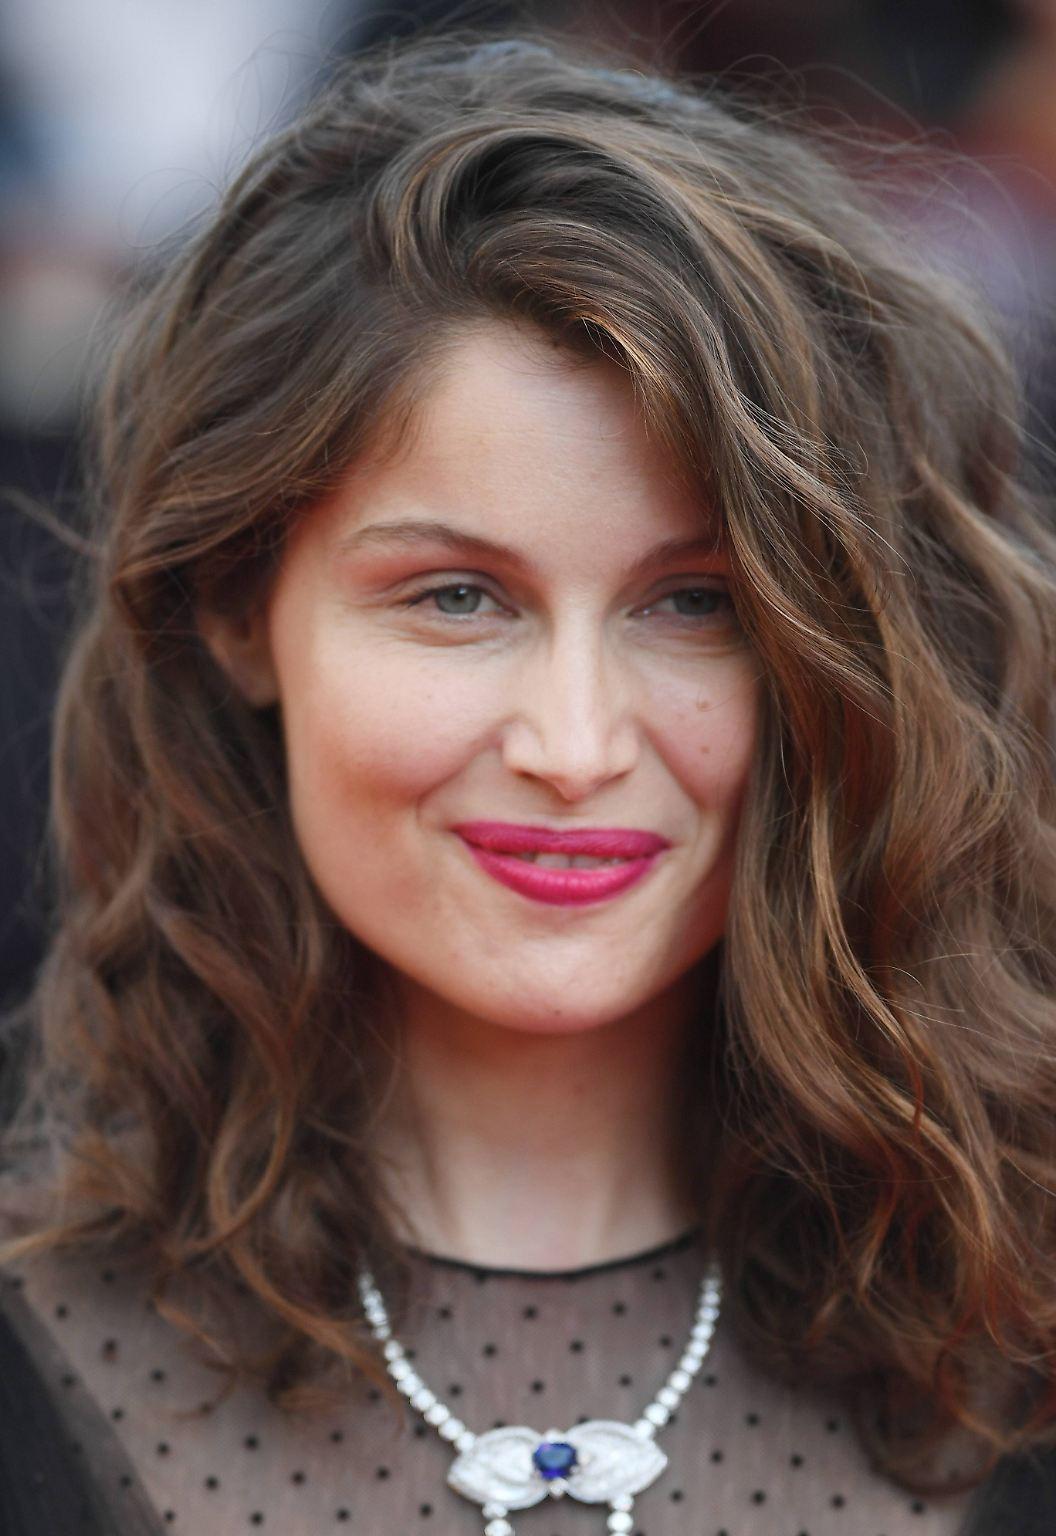 Model, Ikone, Schauspielerin: Laetitia Casta - Sexiest